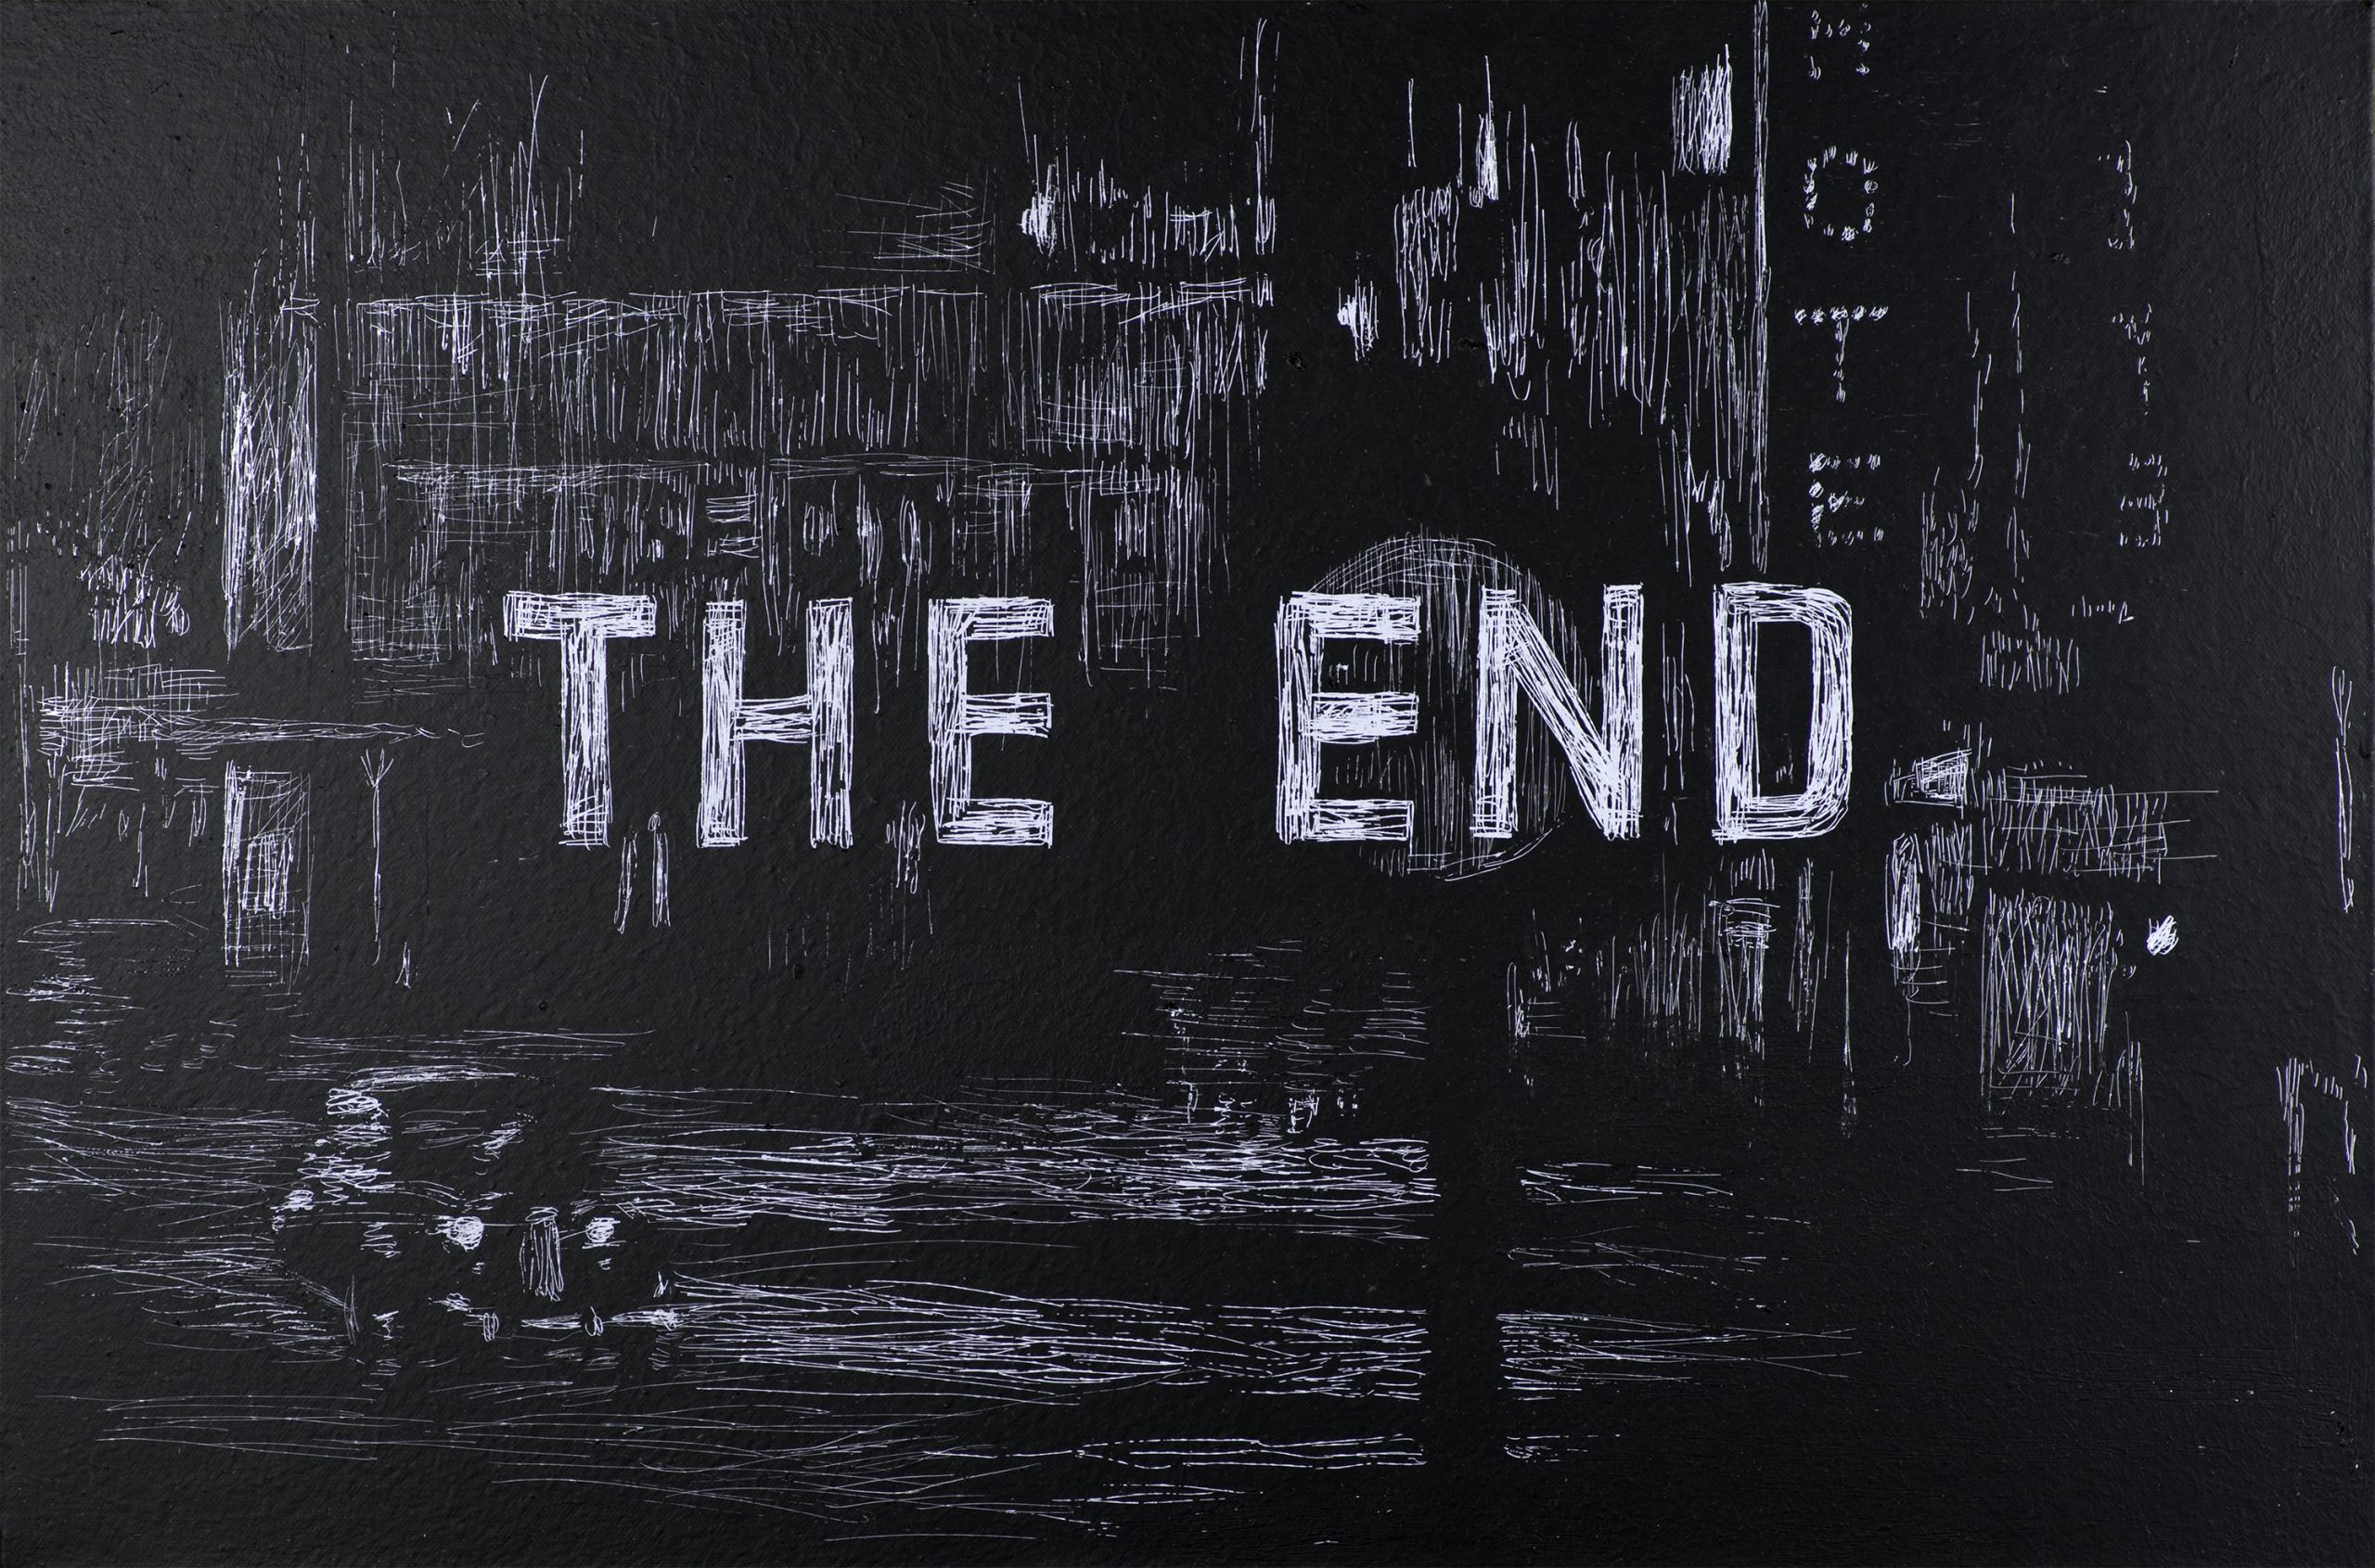 The-End-'Souls'-Nicolas-Ruston